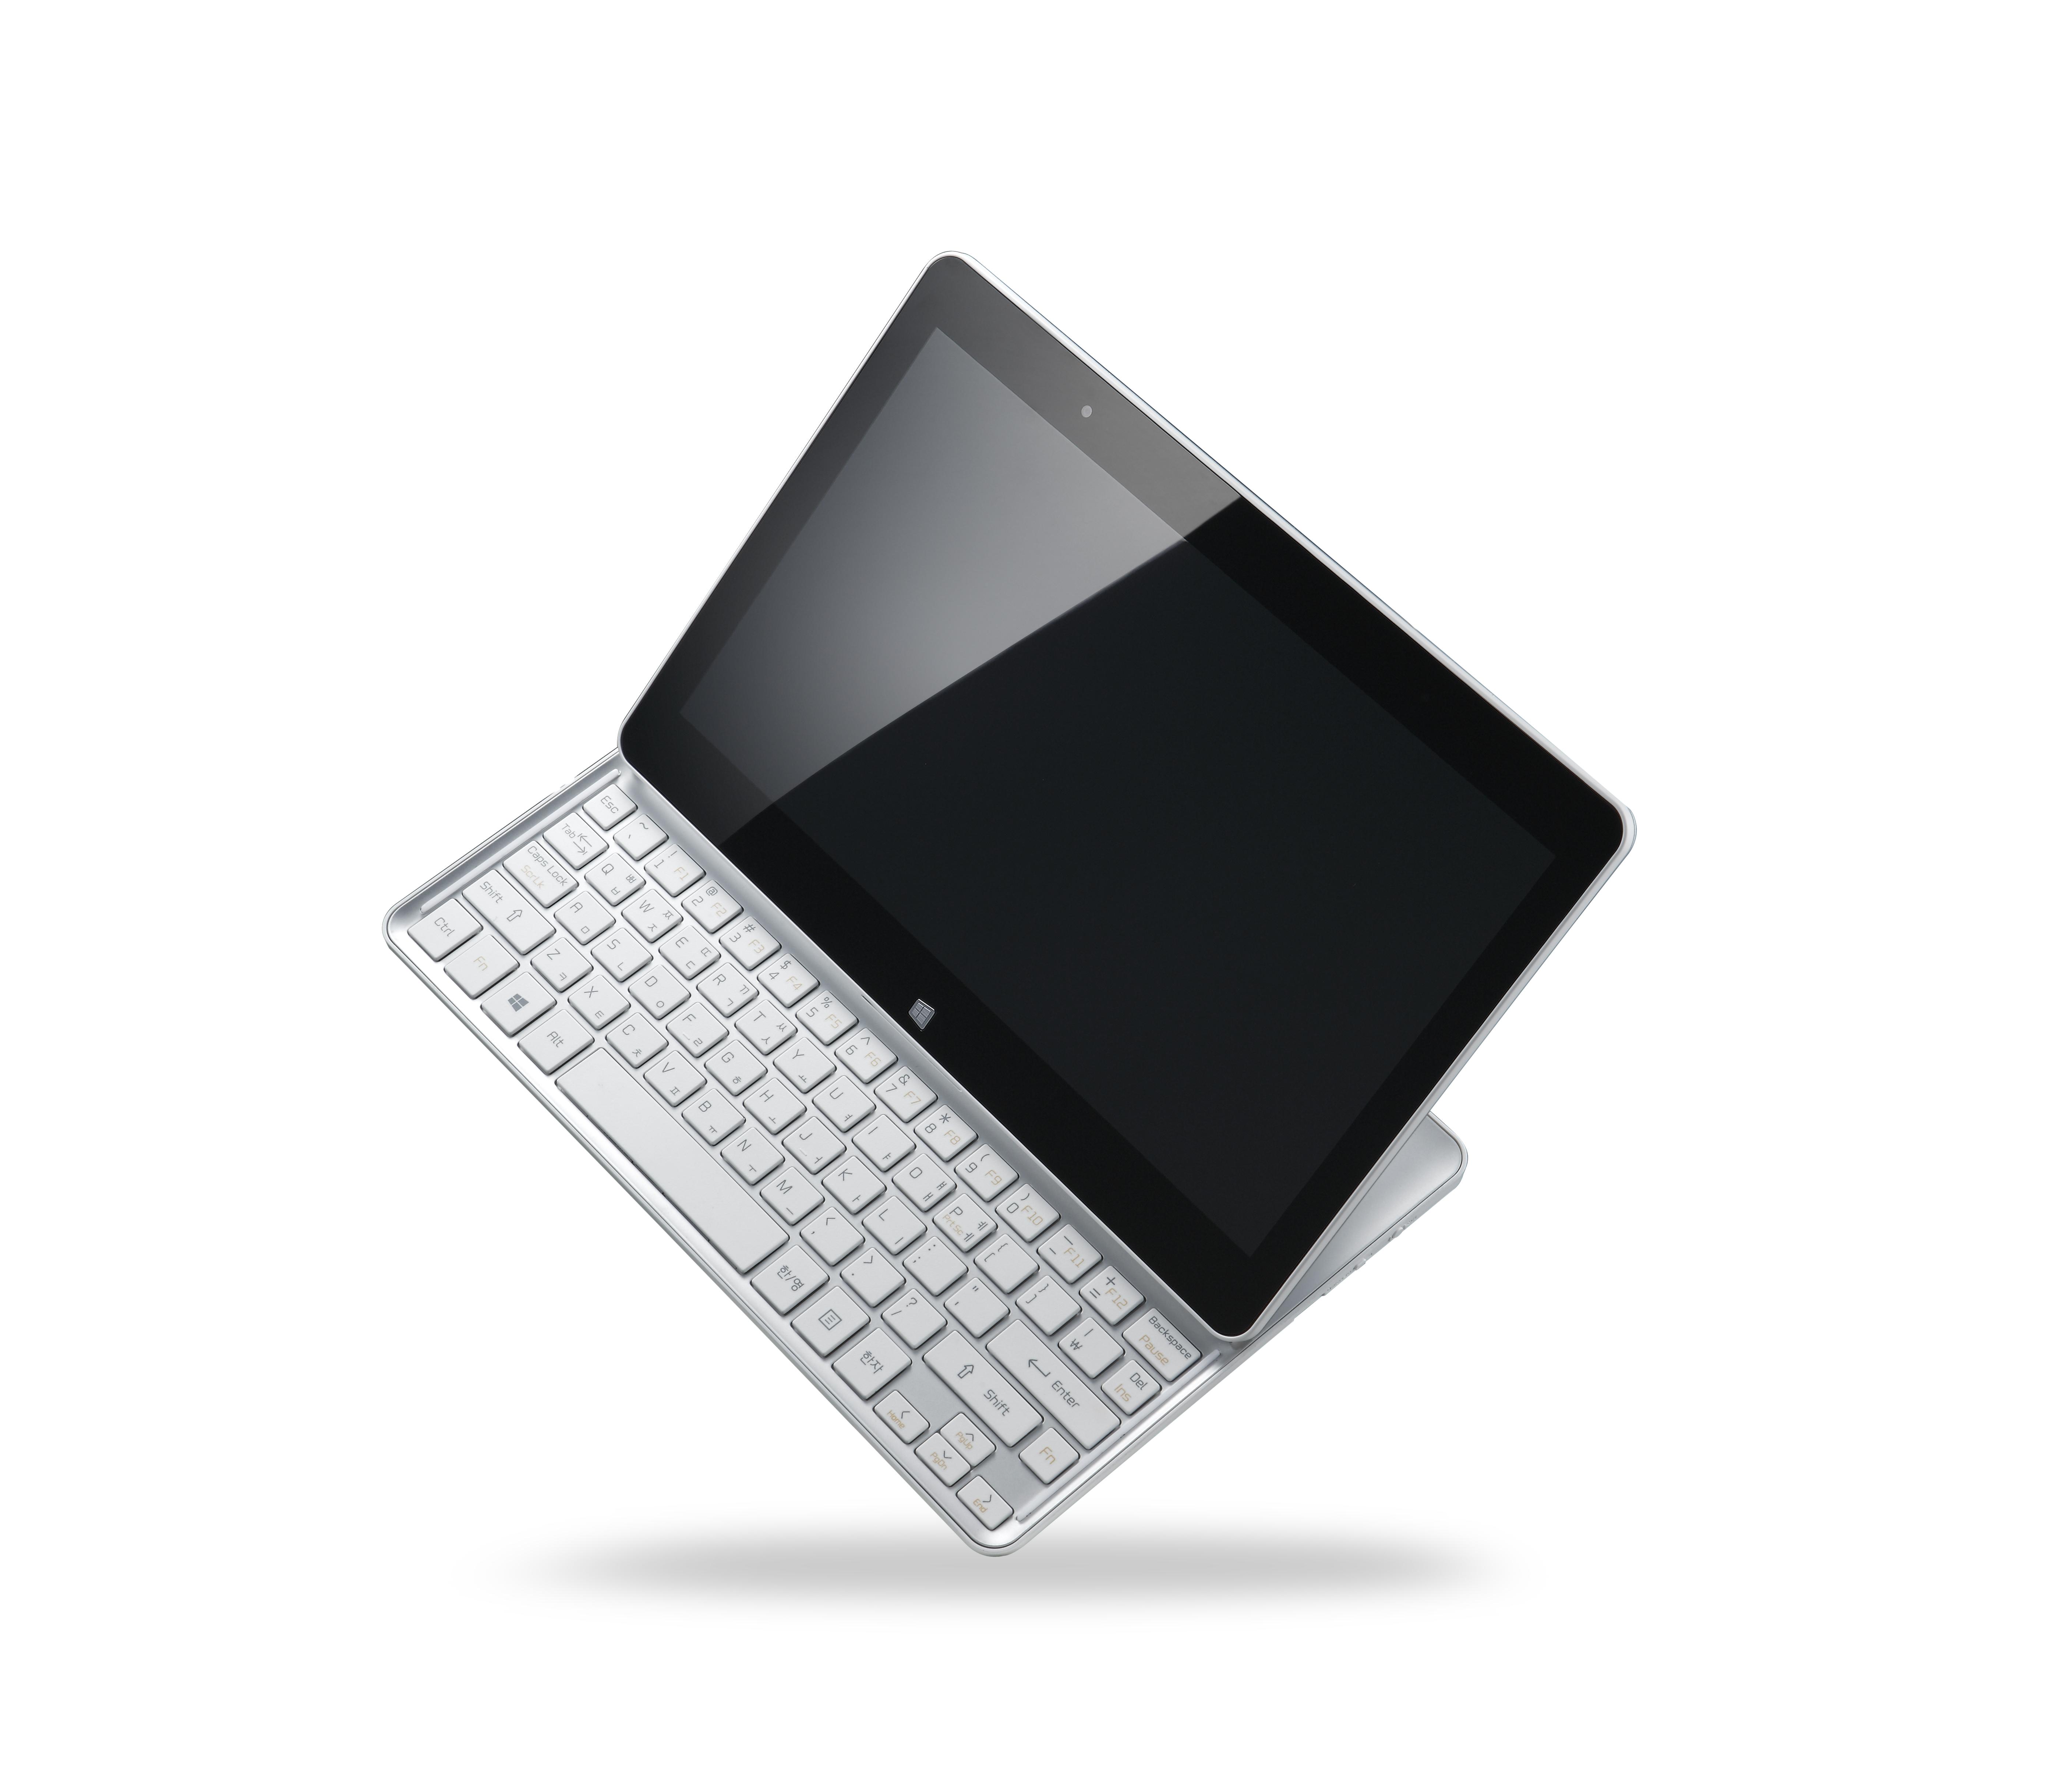 LG Tab-Book Ultra model Z160 balancing on its bottom right corner.